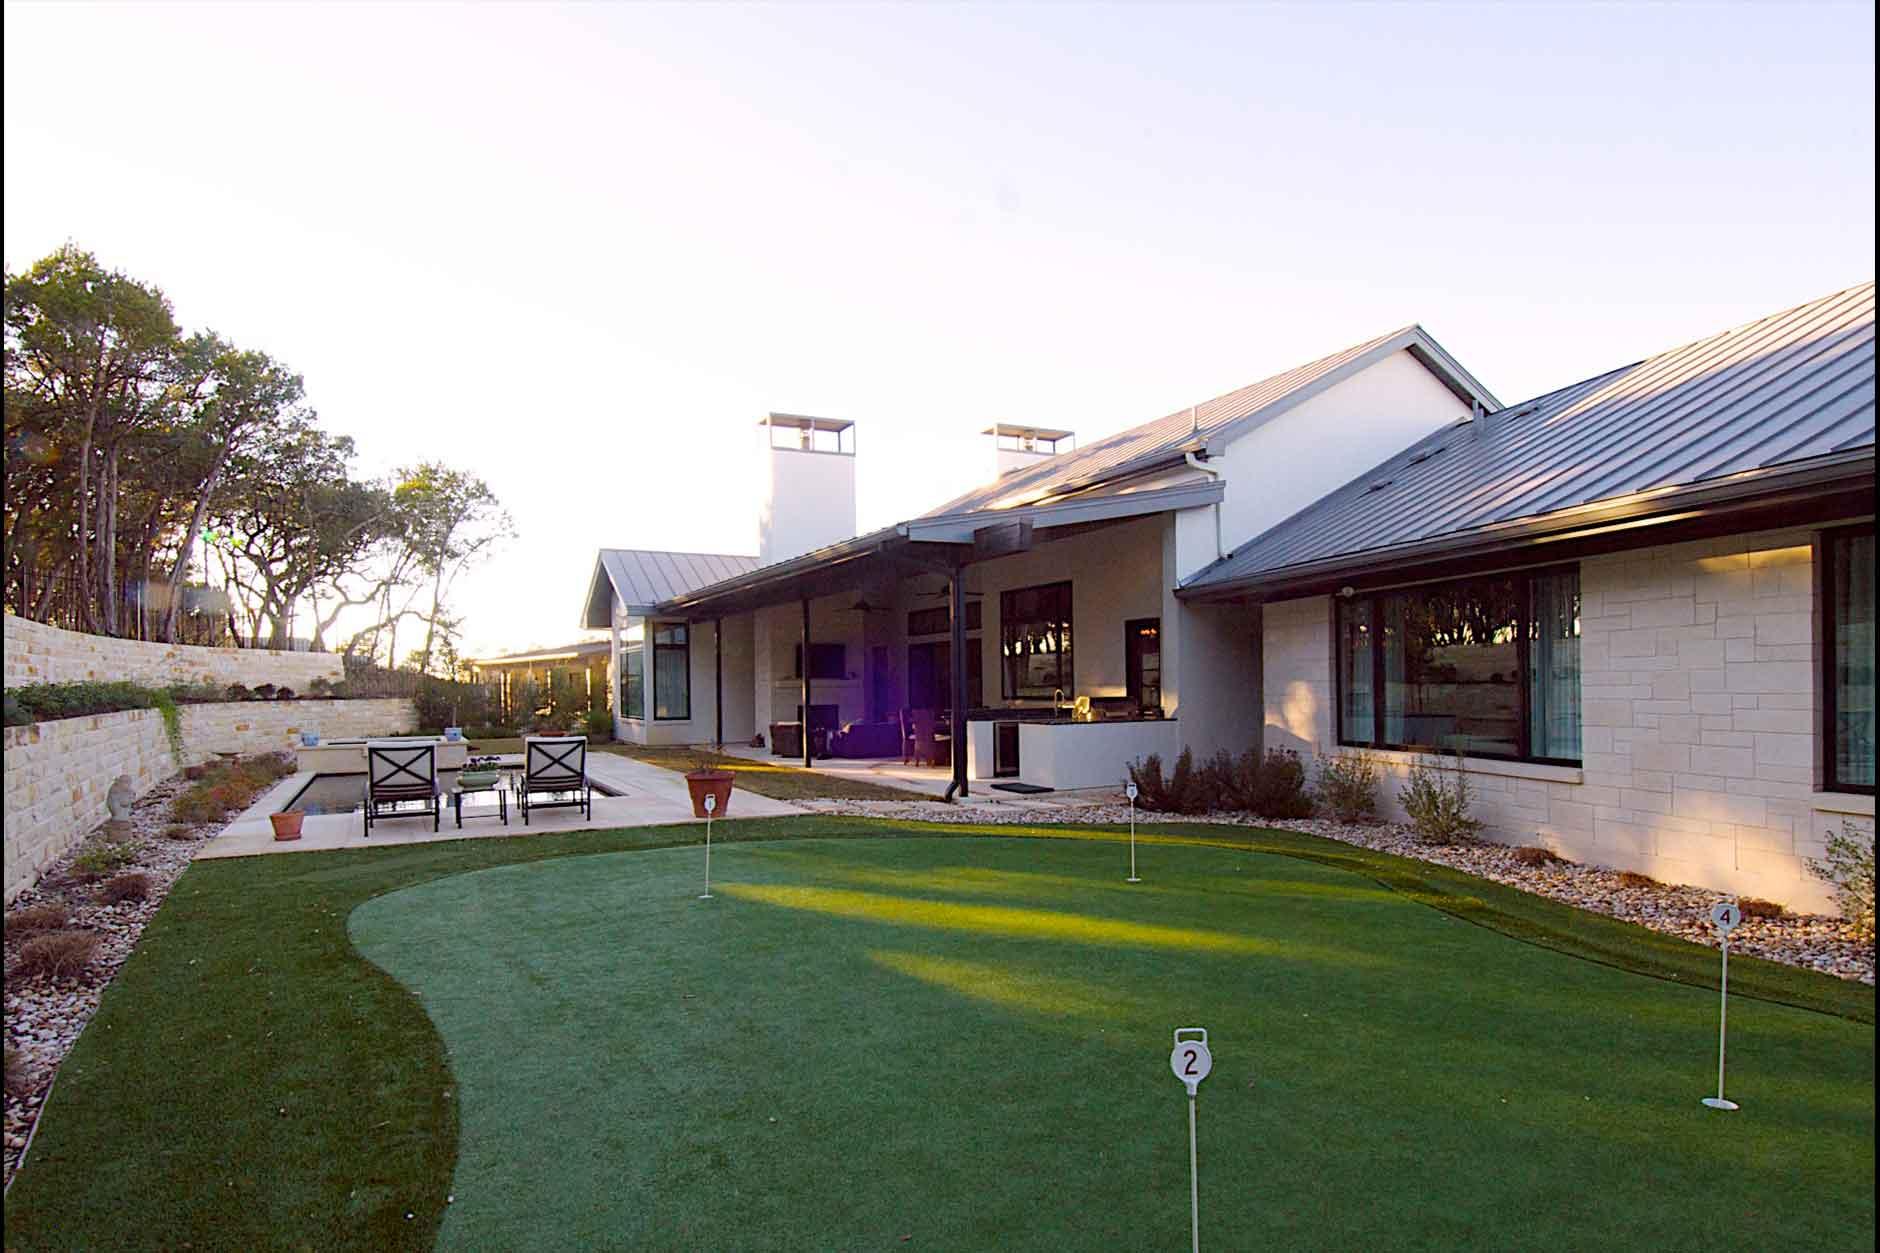 Barton-Creek-Spec1-Golf11-2.jpg